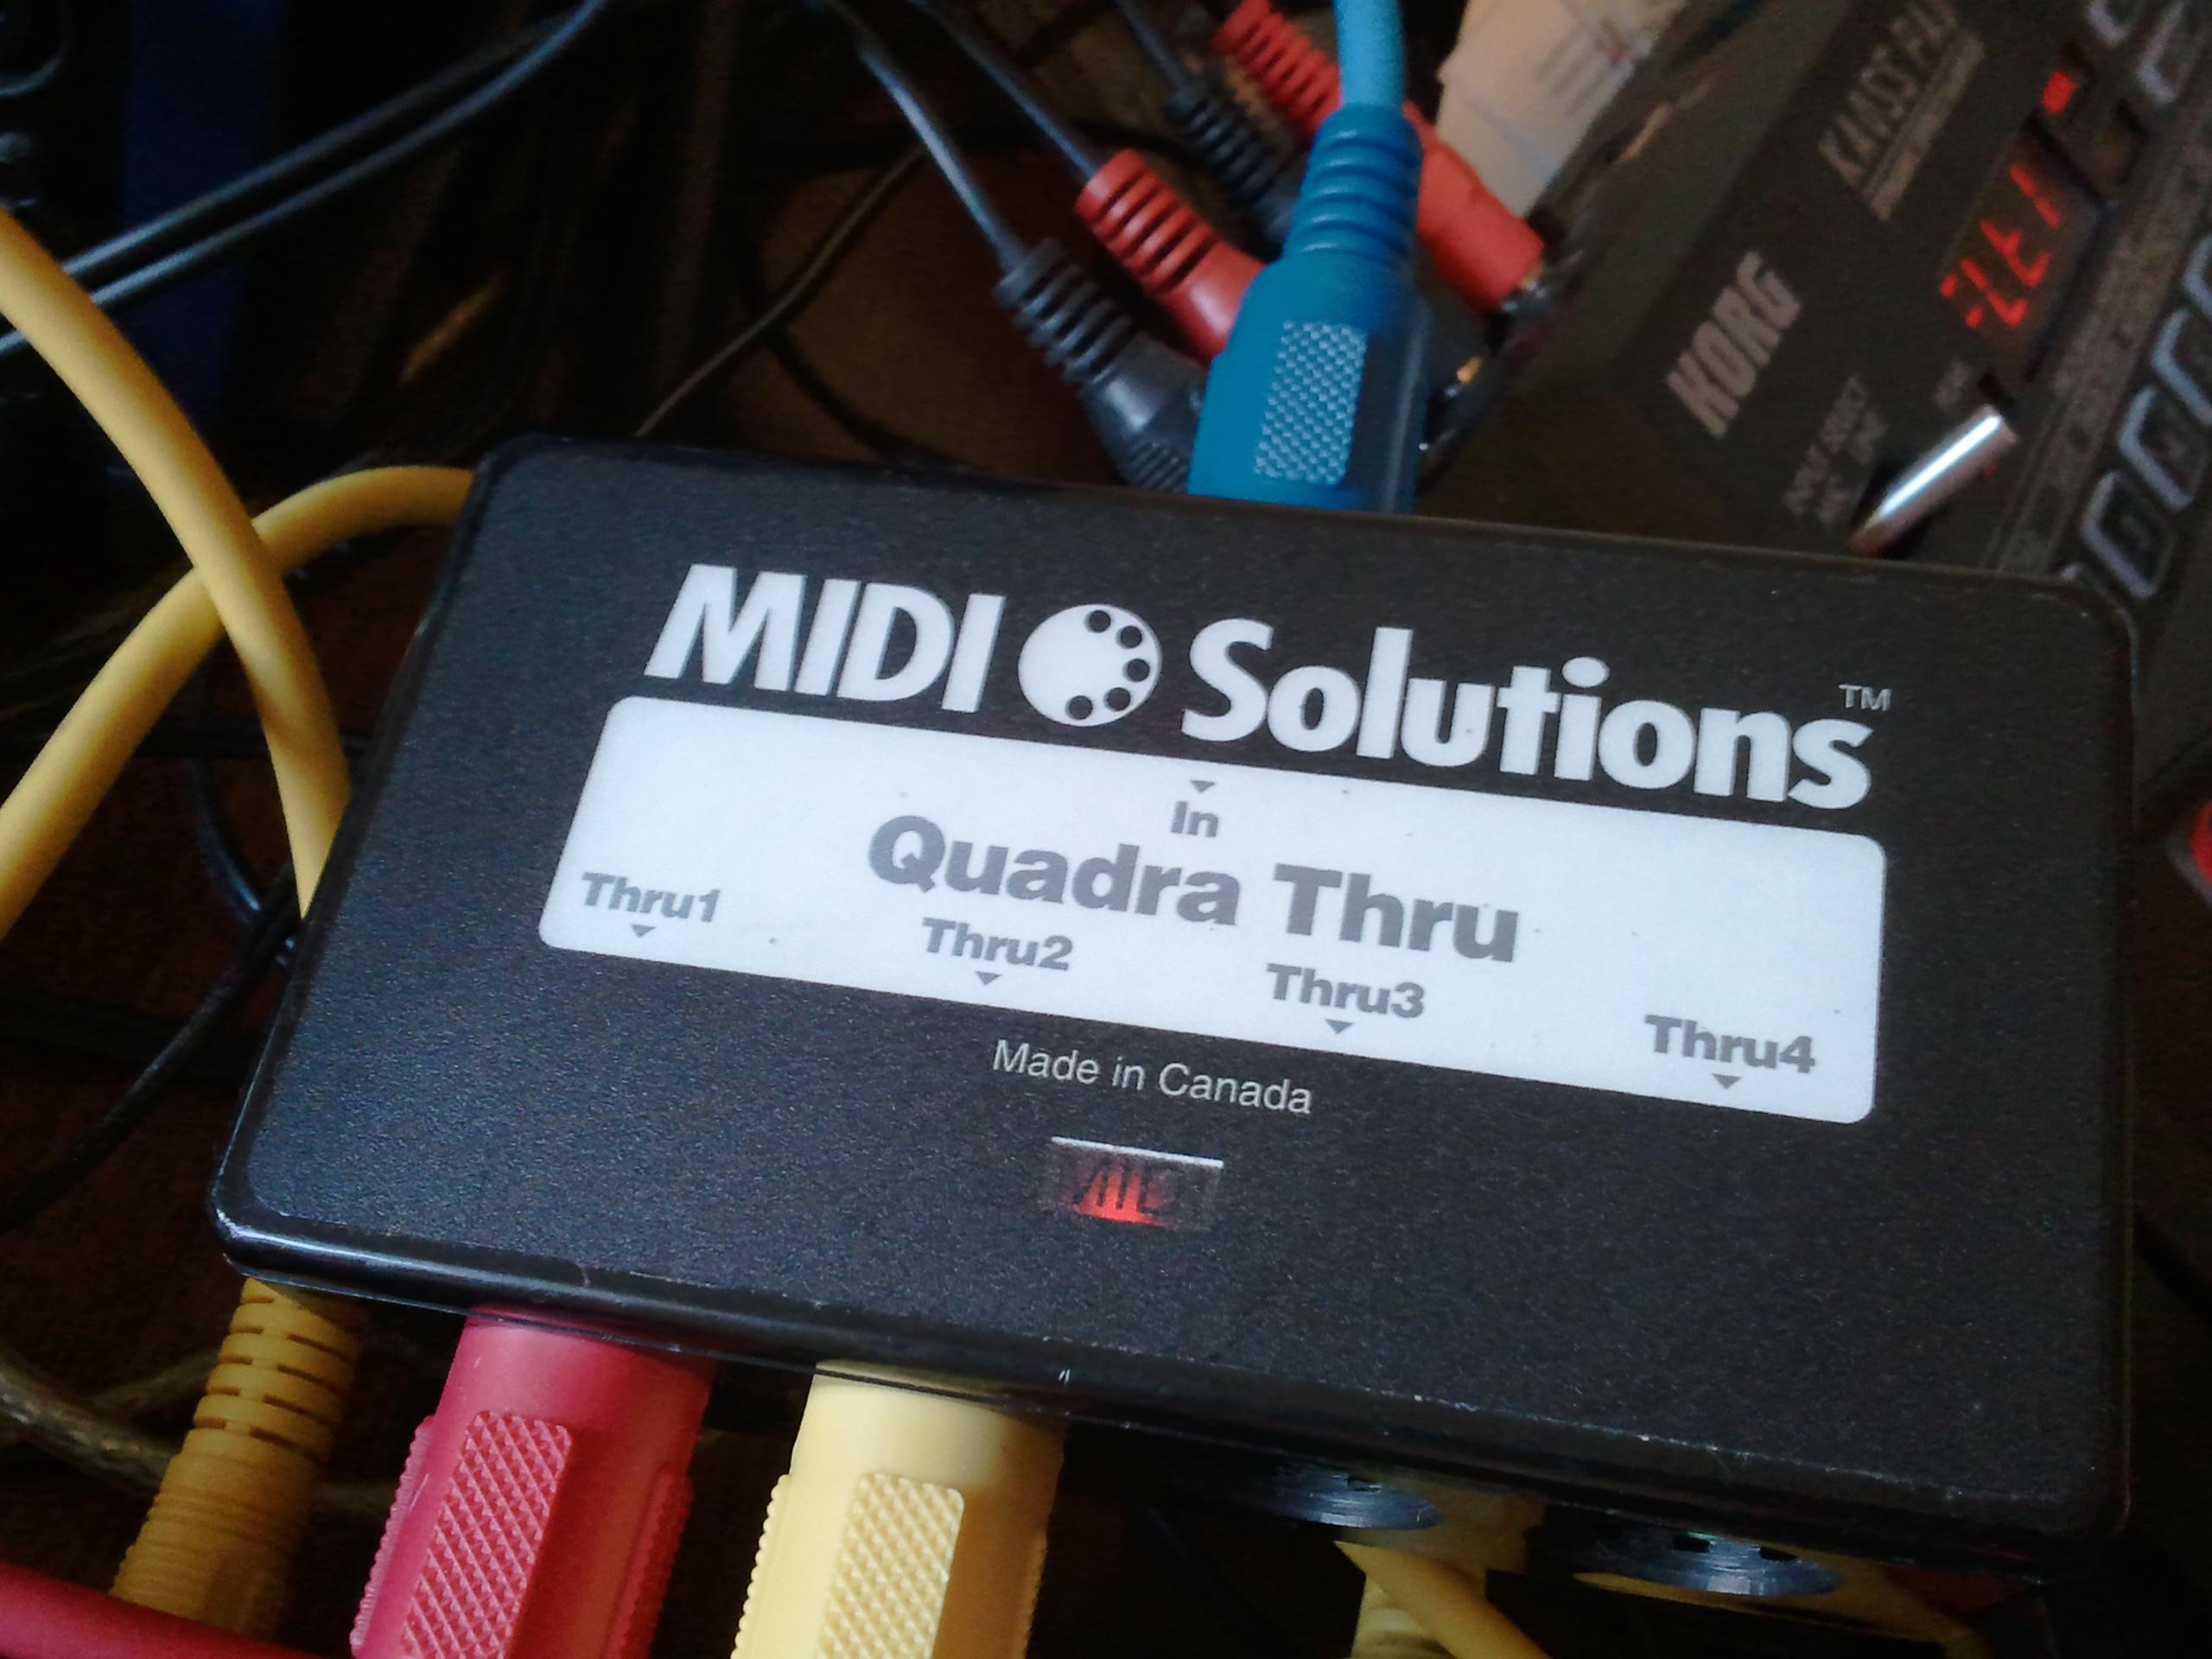 MIDI Solutions Quadra Thru Musical Instruments DJ, Electronic ...